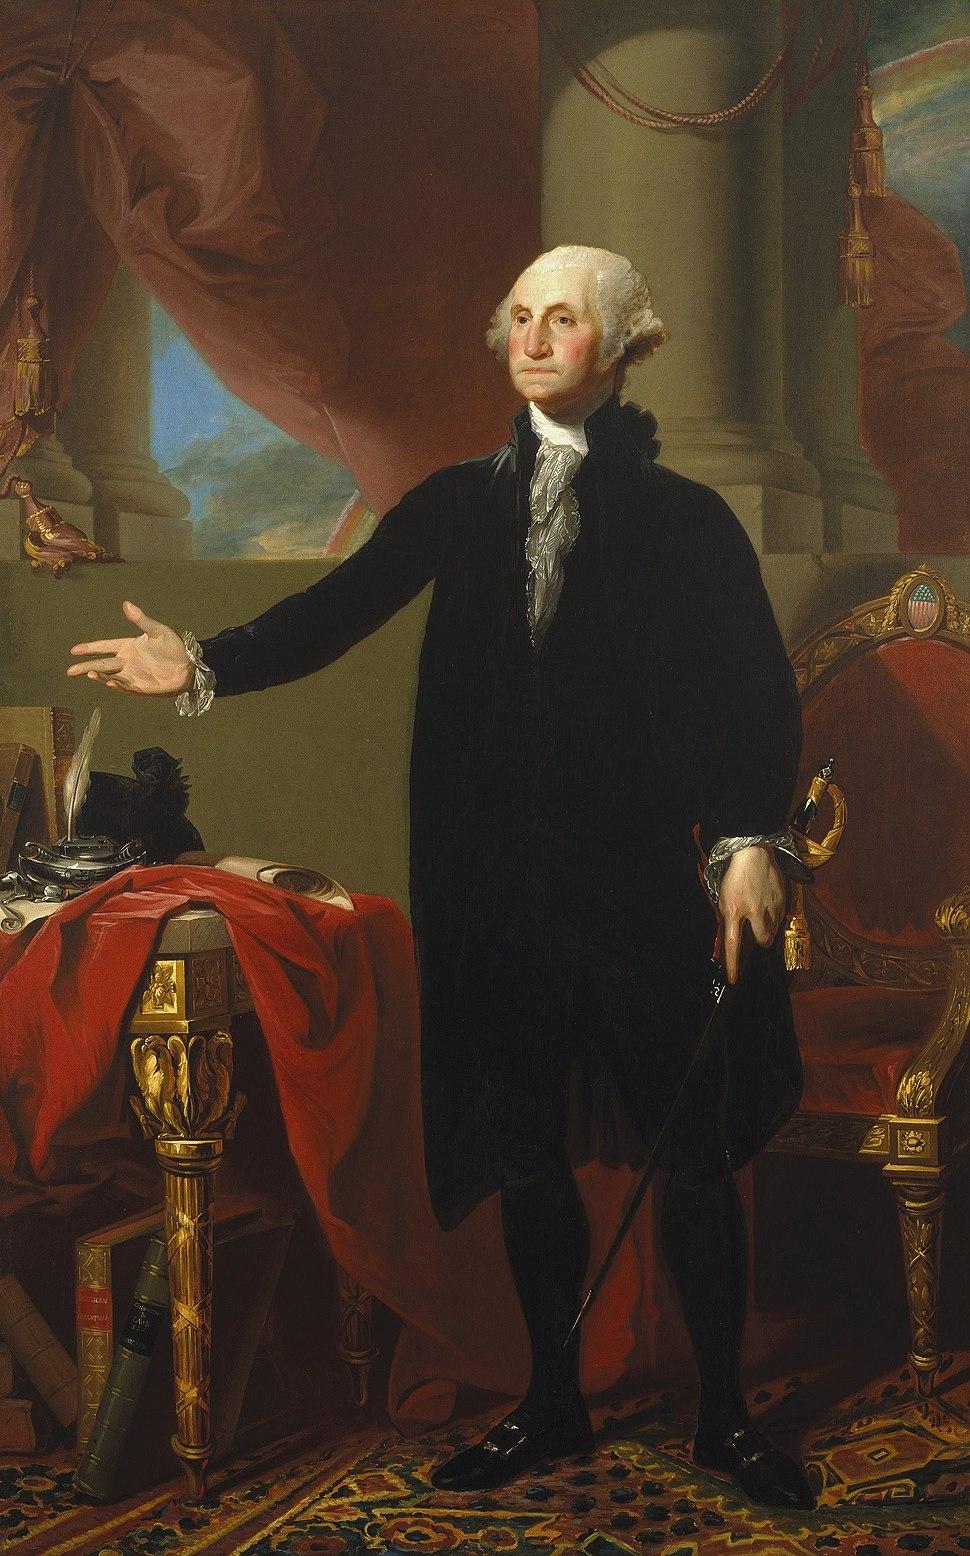 Gilbert Stuart - George Washington - Google Art Project (6966745)